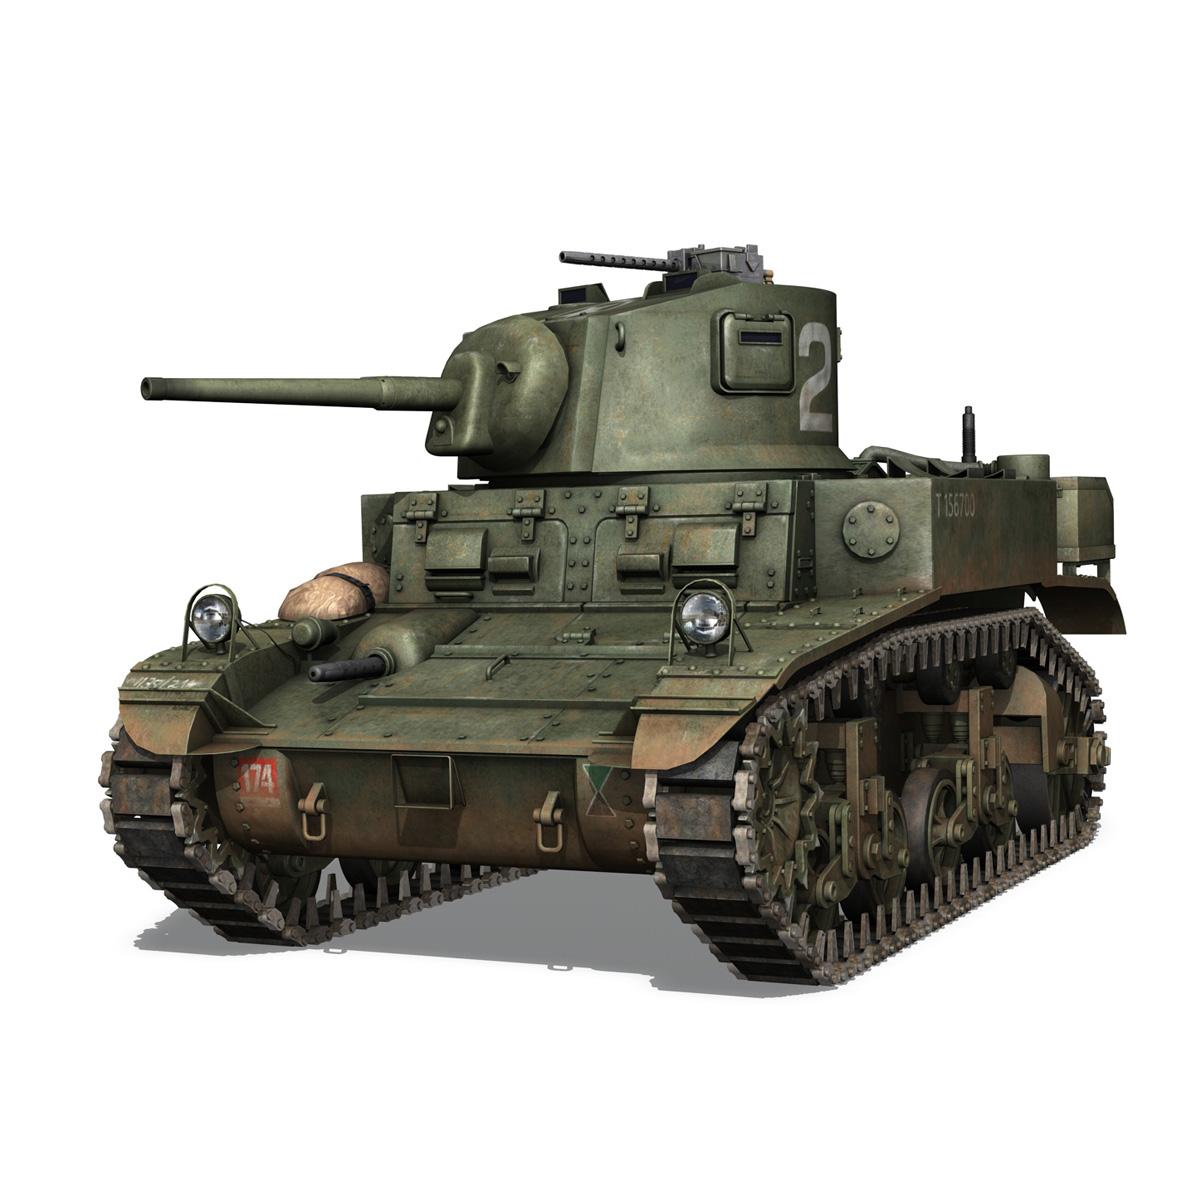 m3a1 light tank stuart – 156700 3d model c4d fbx lwo lw lws obj 3ds 265337